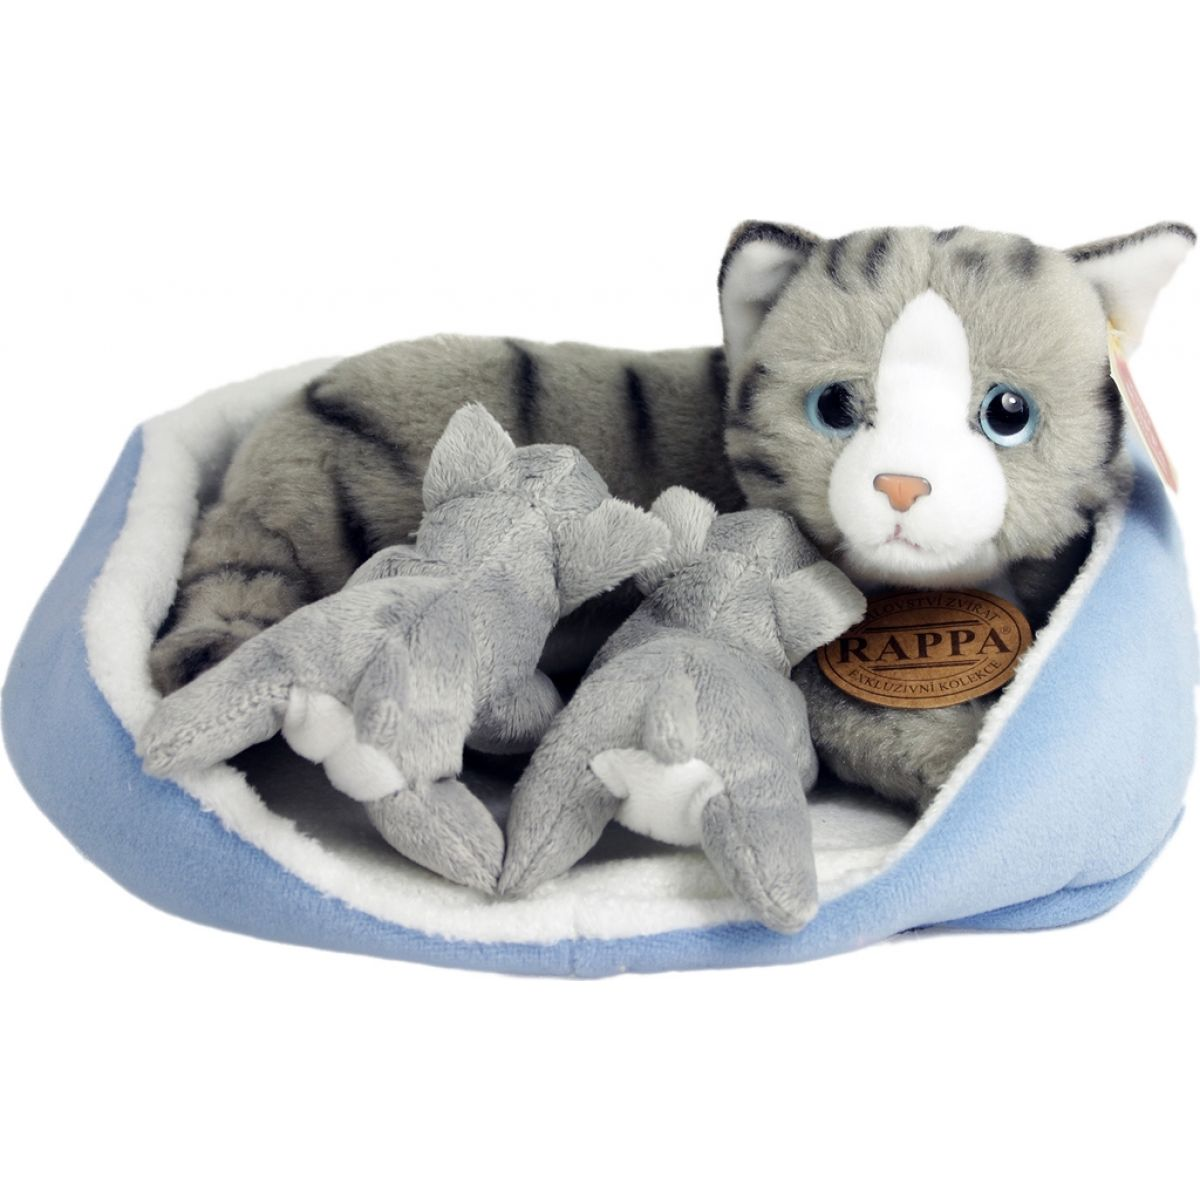 Plyšová kočka s mláďaty v pelíšku